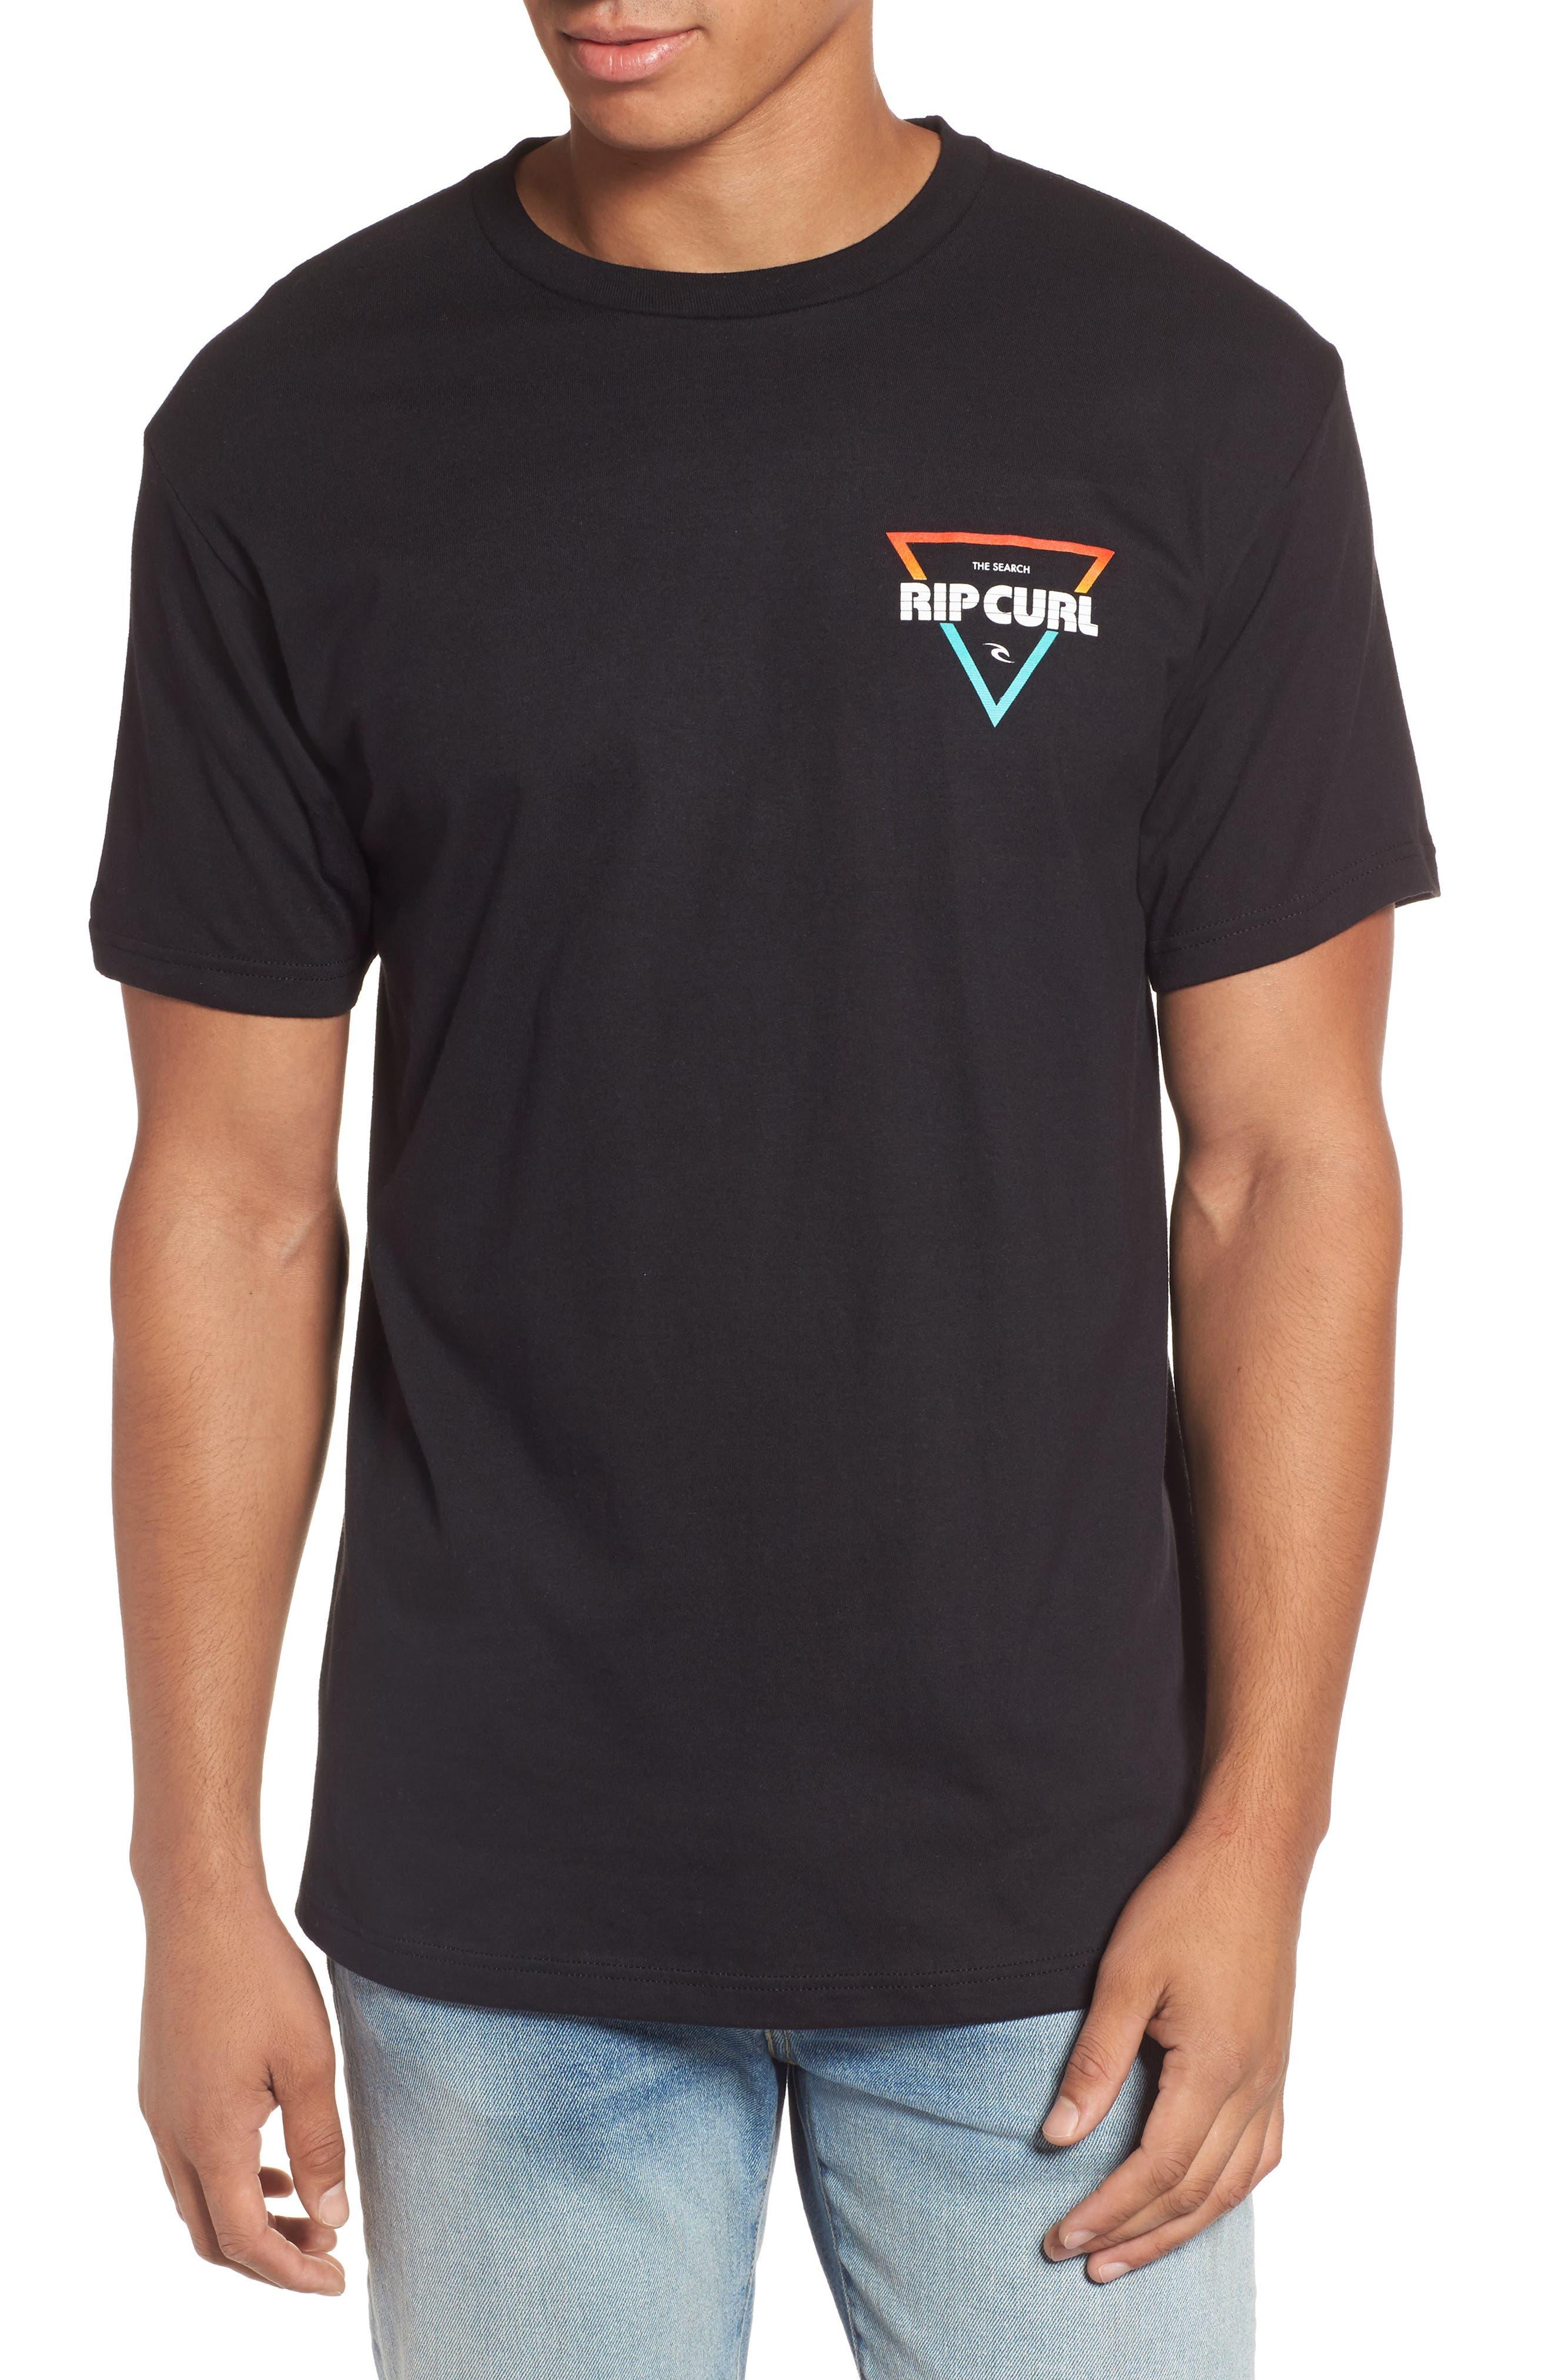 Rip Curl The Edge Premium Graphic T-Shirt